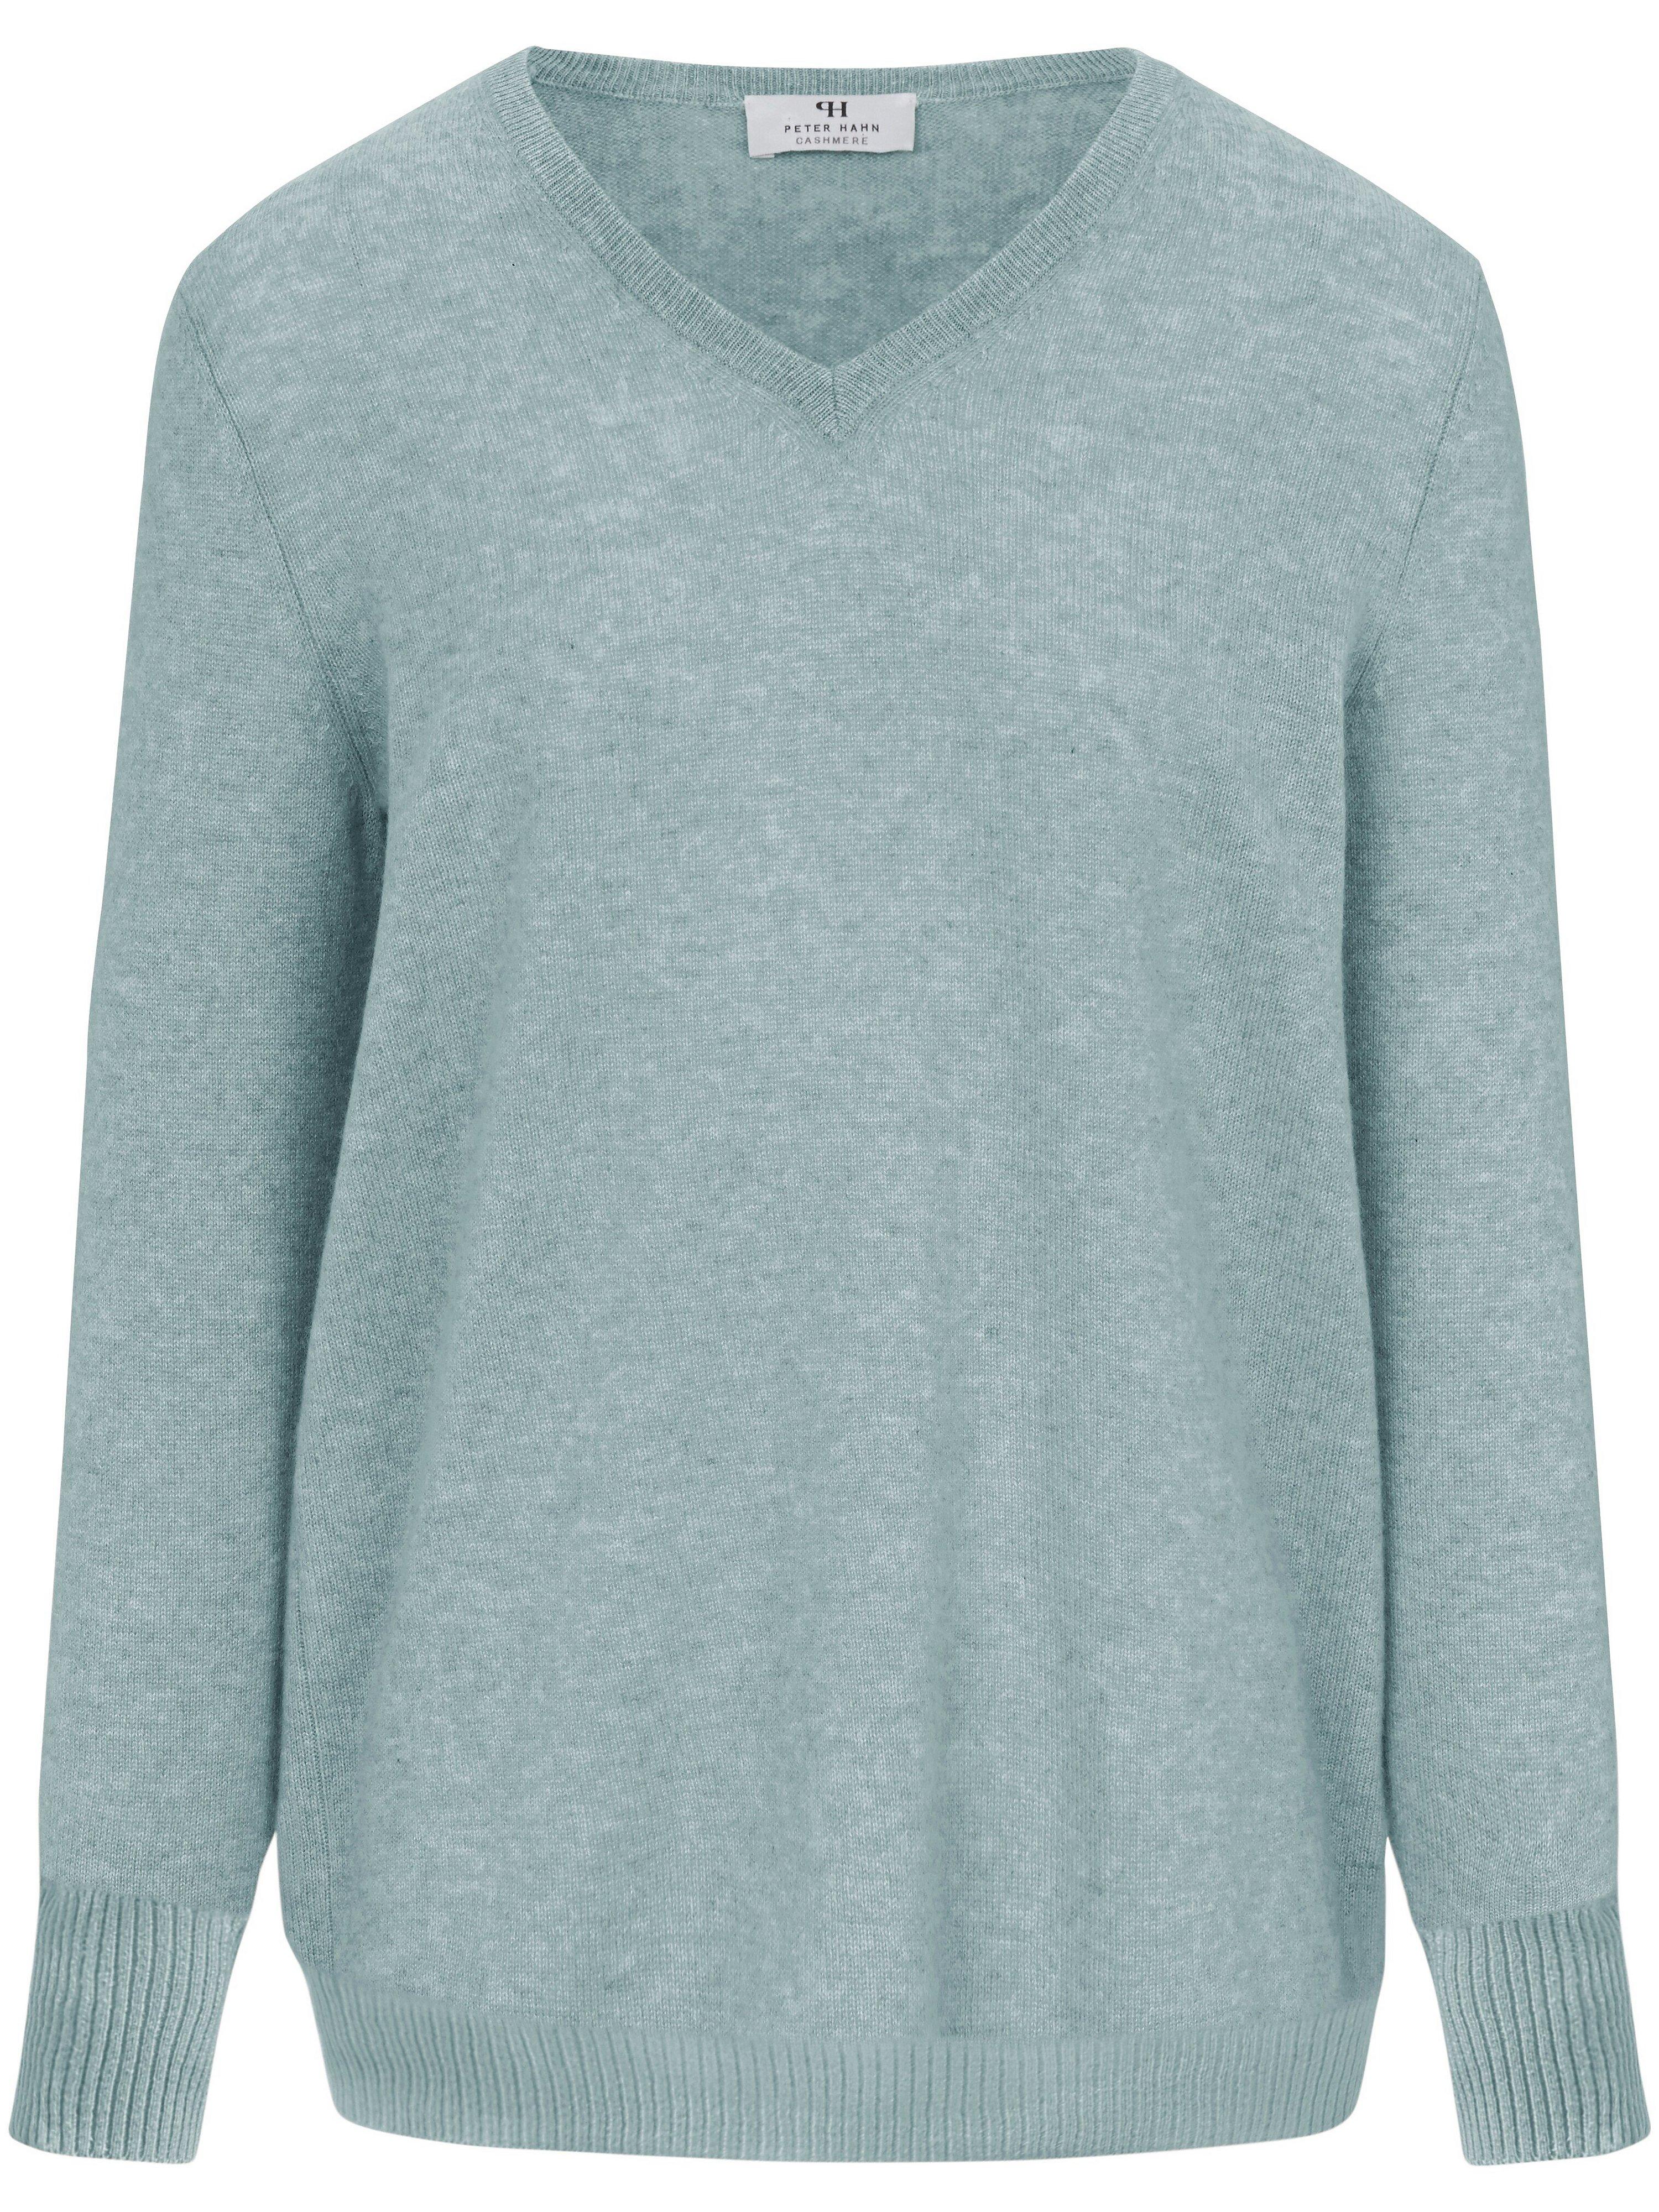 V-Pullover aus 100% PREMIUM Kaschmir Peter Hahn Cashmere grün | Bekleidung > Pullover > V-Pullover | Peter Hahn Cashmere